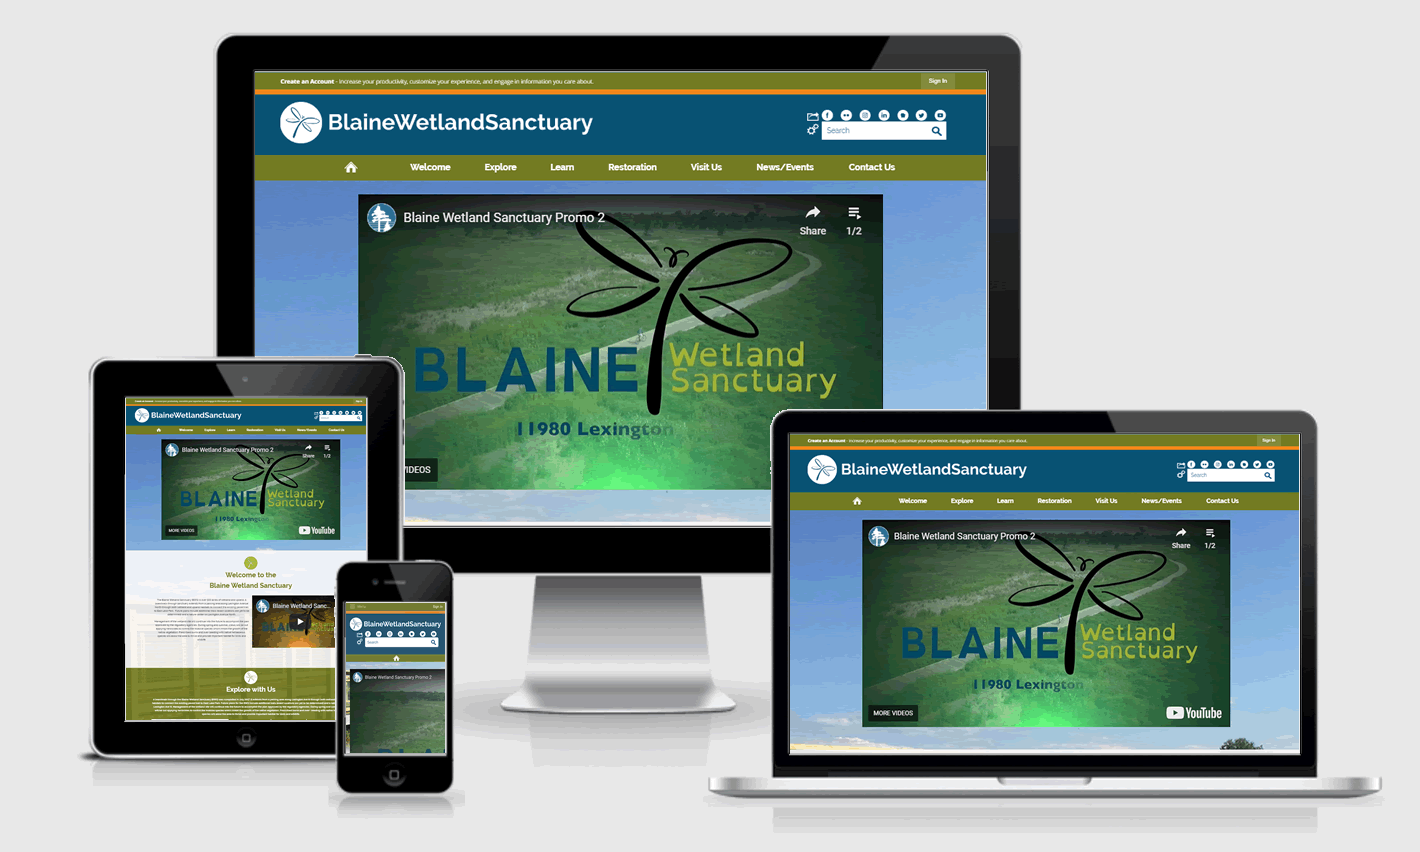 Blaine Wetland Sanctuary